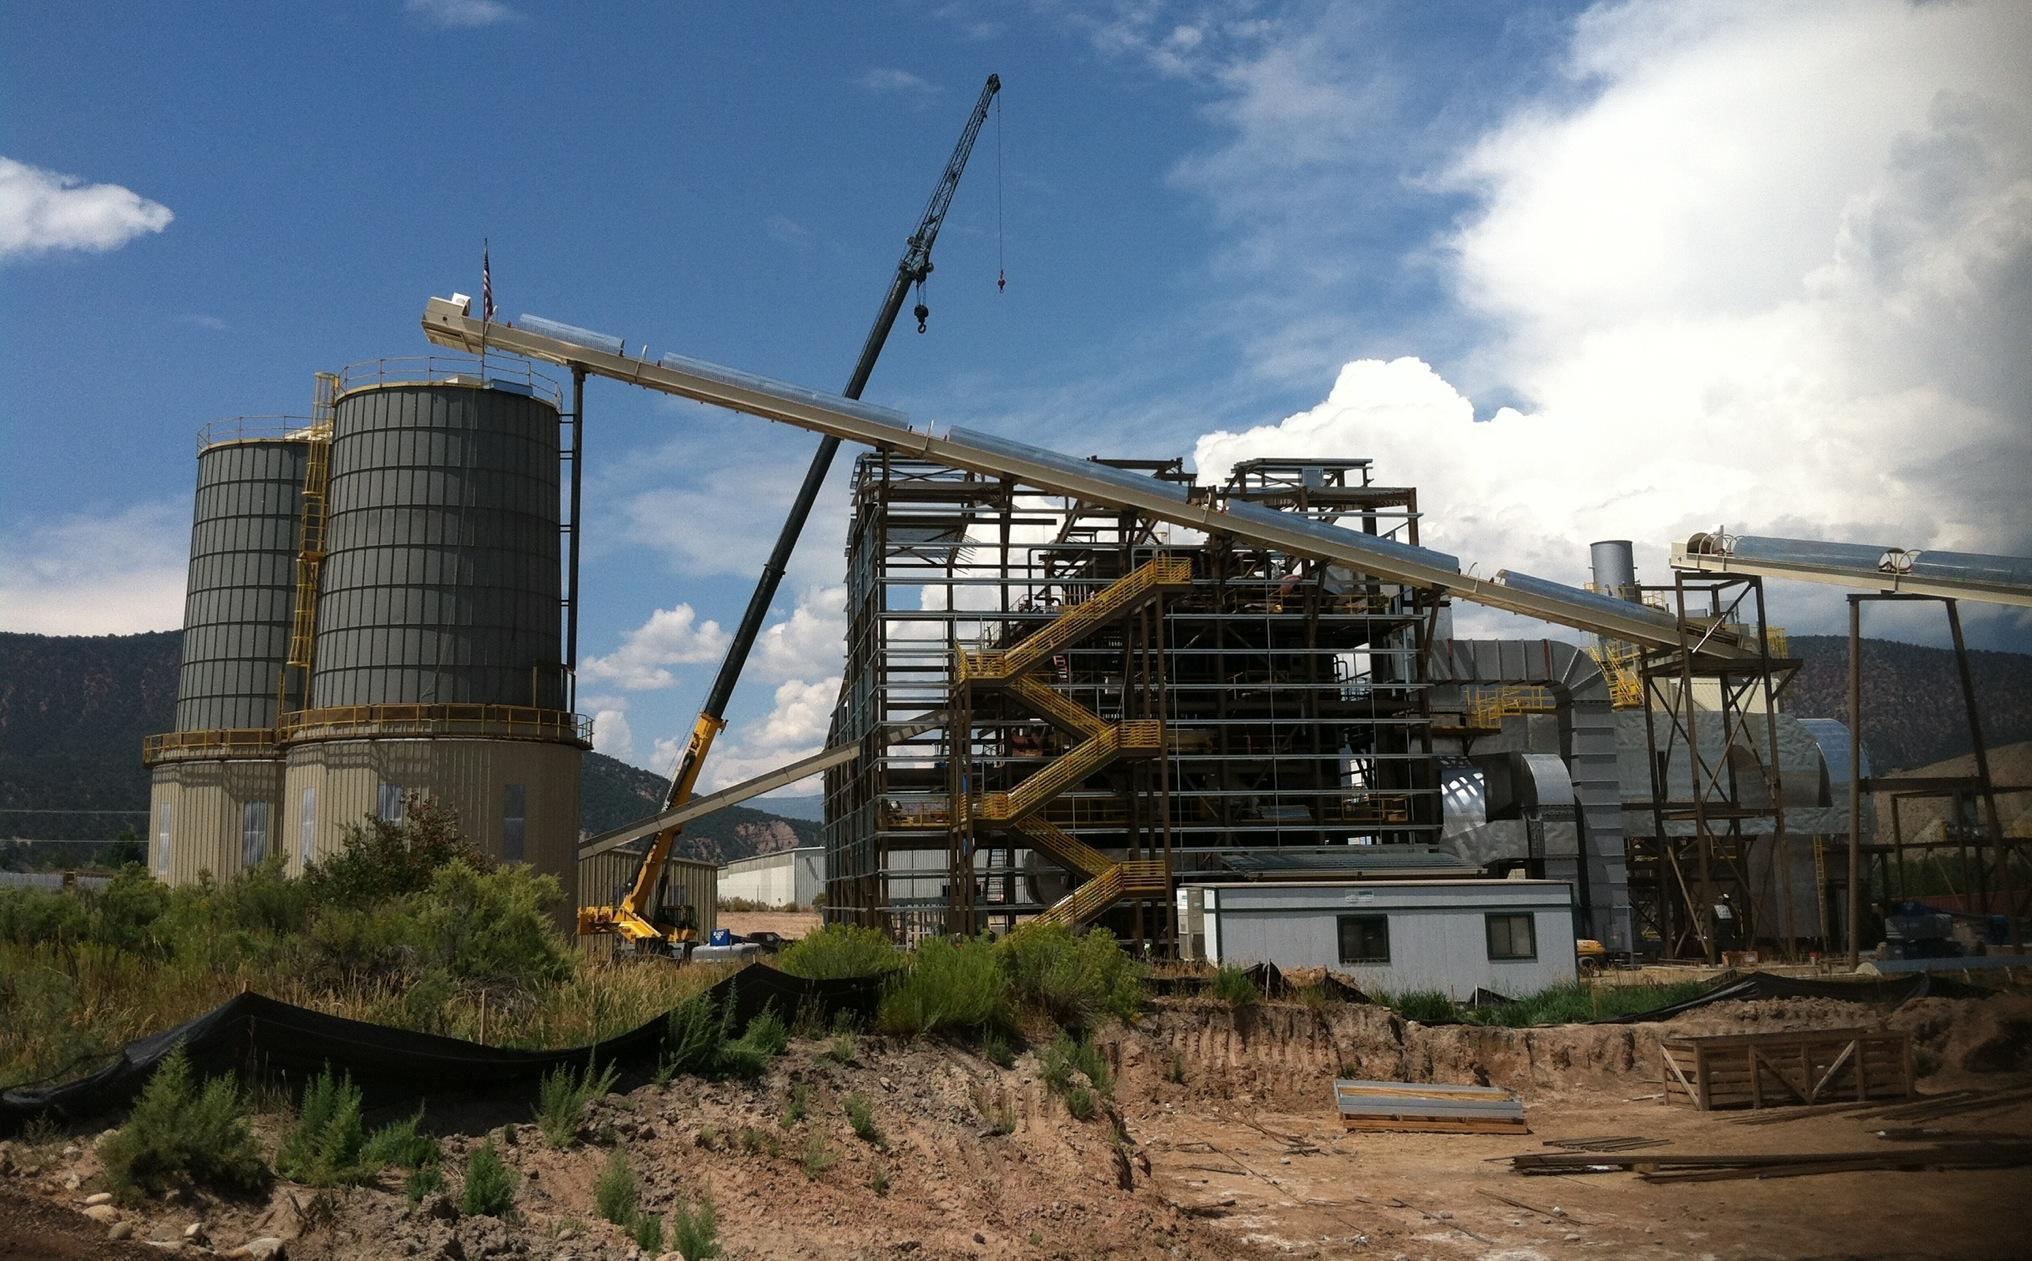 biomass power plant - photo #3